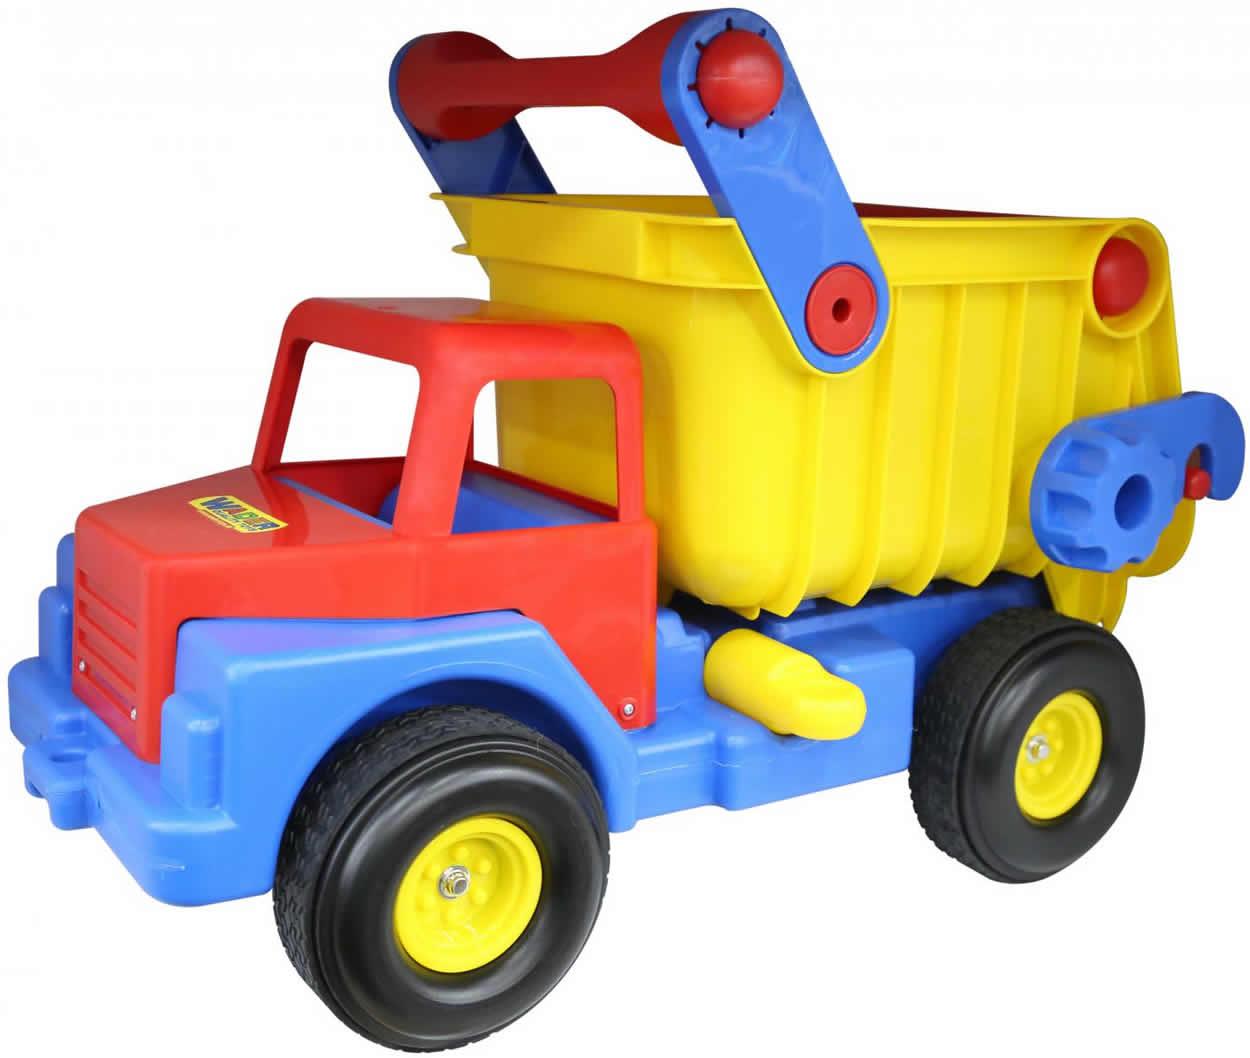 wader truck no 1 lastwagen lkw kipper mit gummireifen ebay. Black Bedroom Furniture Sets. Home Design Ideas